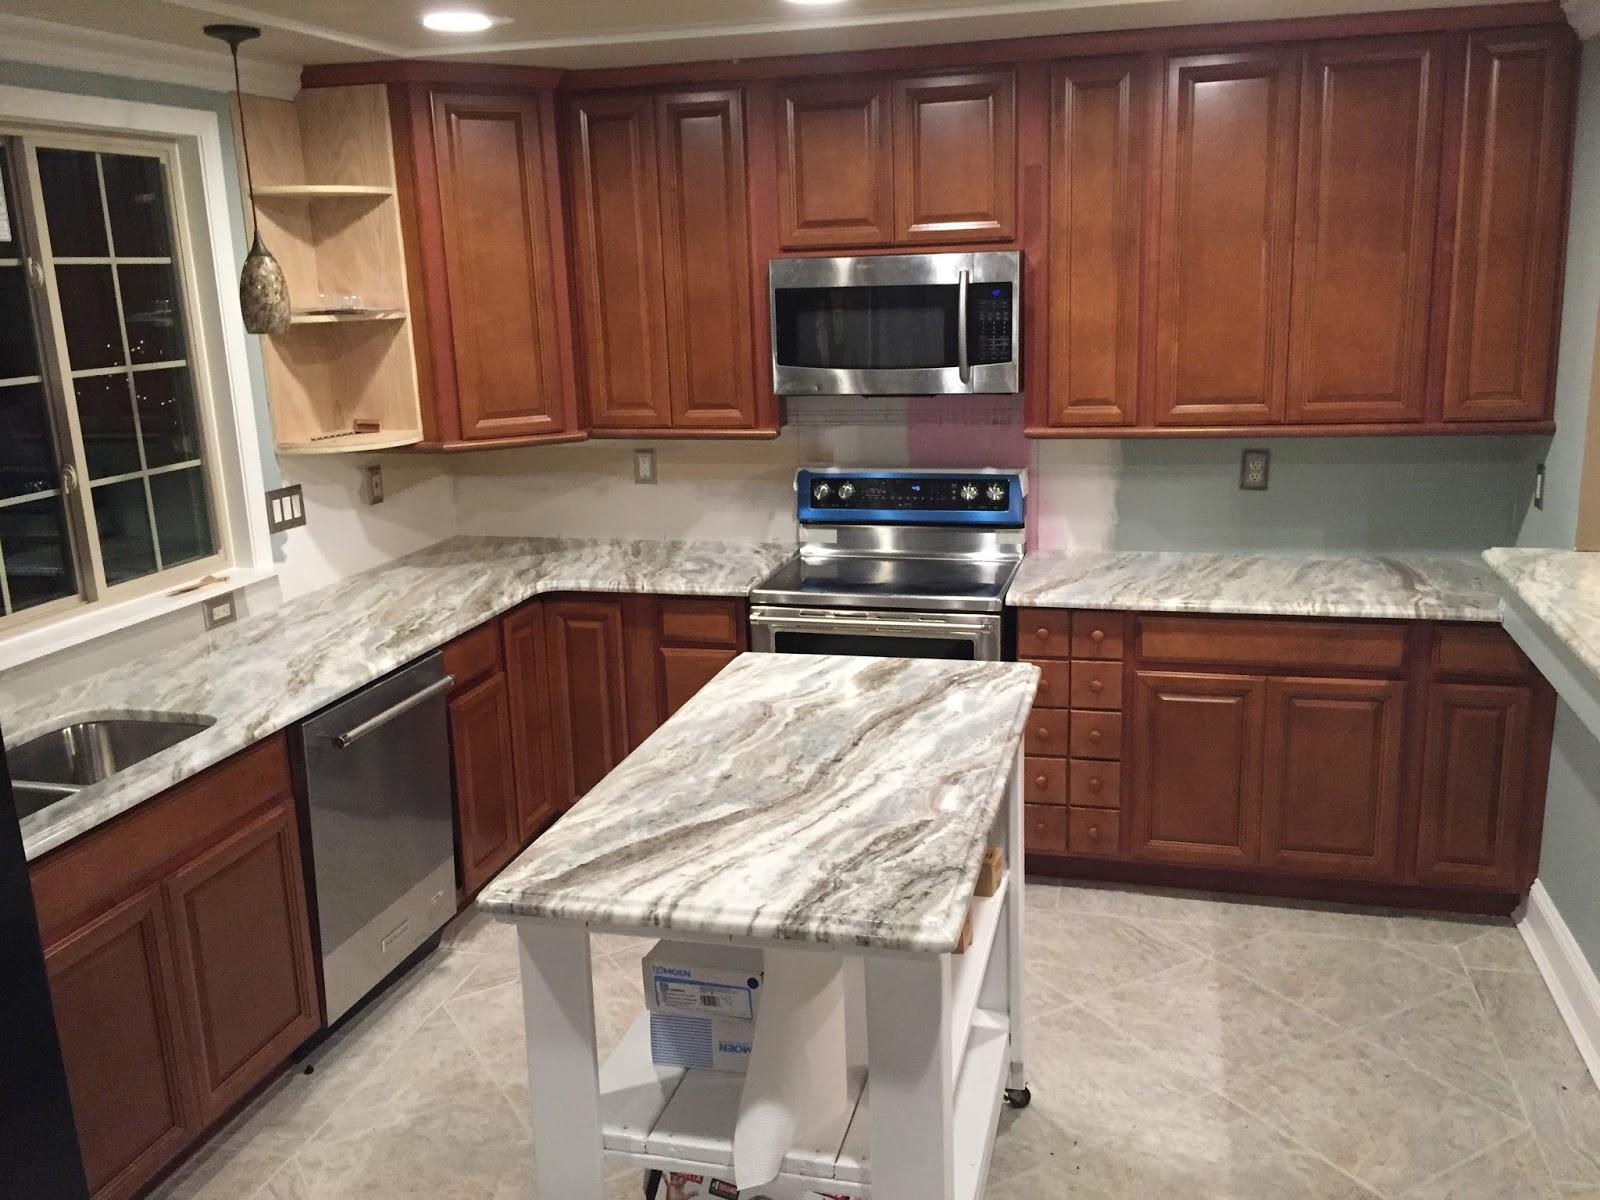 Granite Budget Kitchen Countertops Charlotte Kitchen Countertop Trends For 2016 Beyond